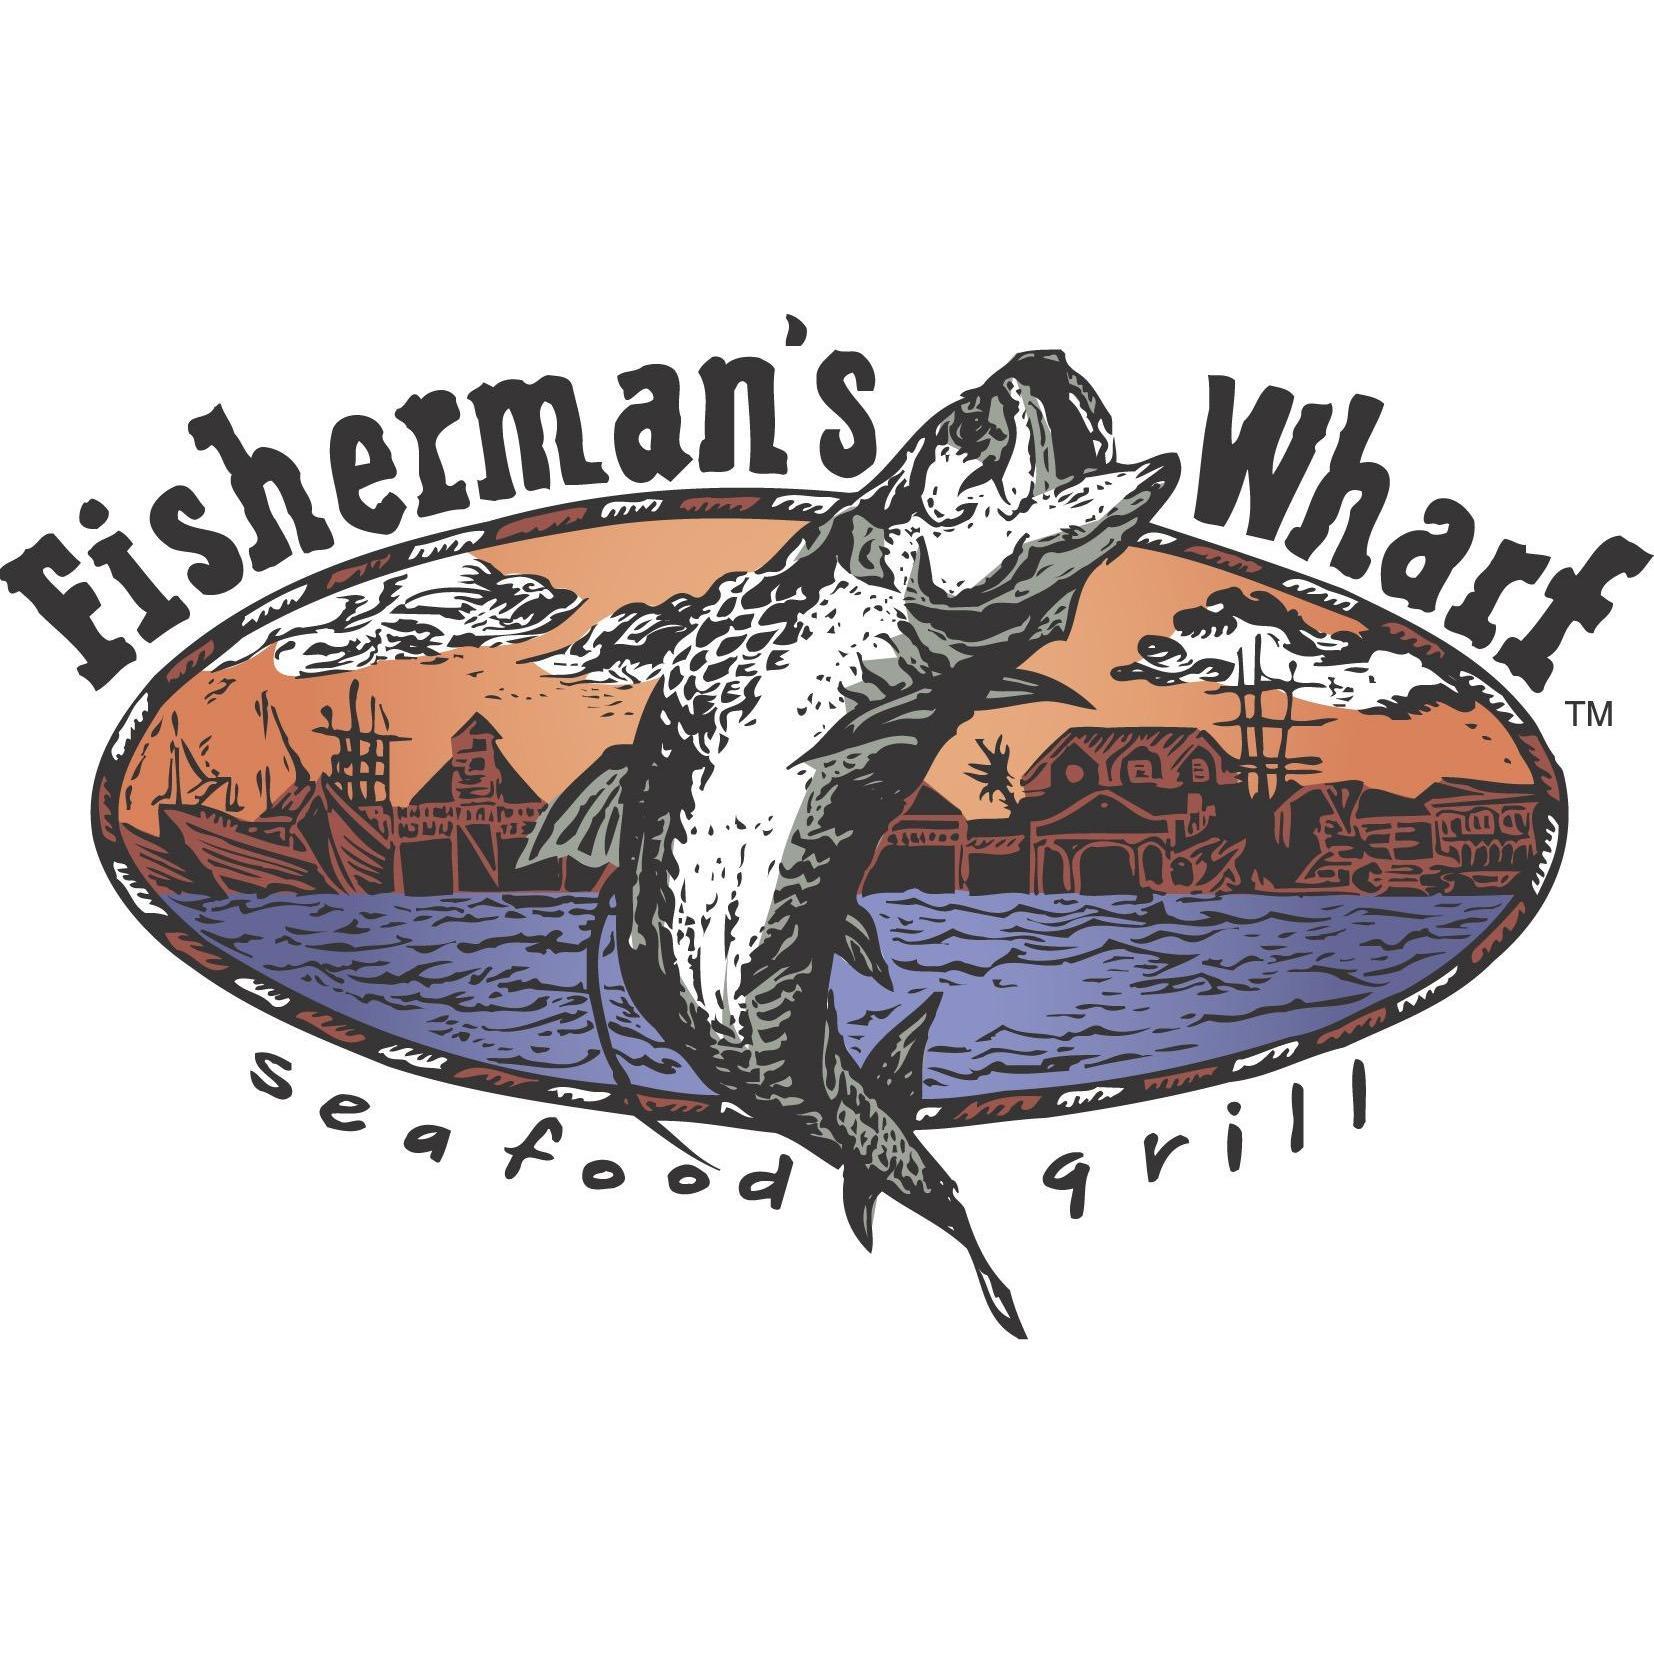 Fisherman's Wharf image 5